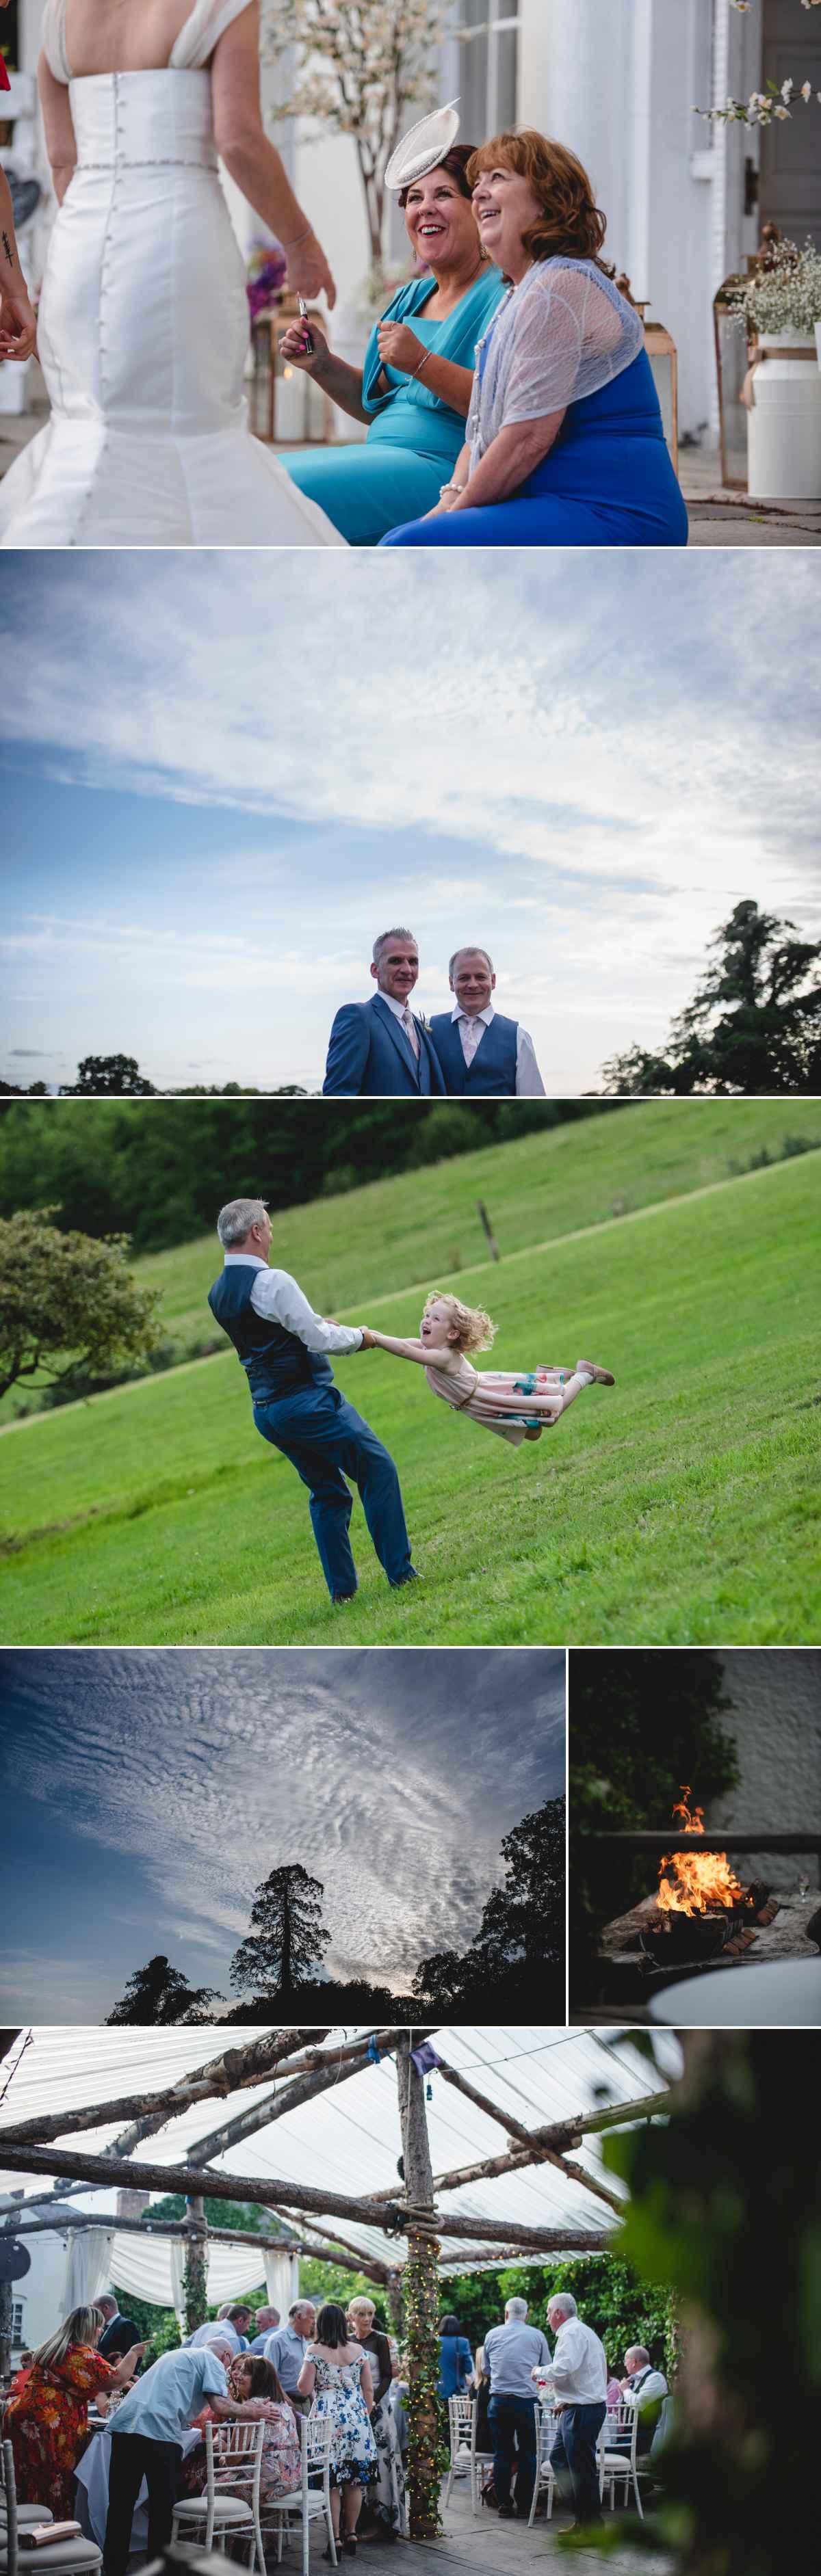 Rustic Wedding Ireland Photographer 16.jpg